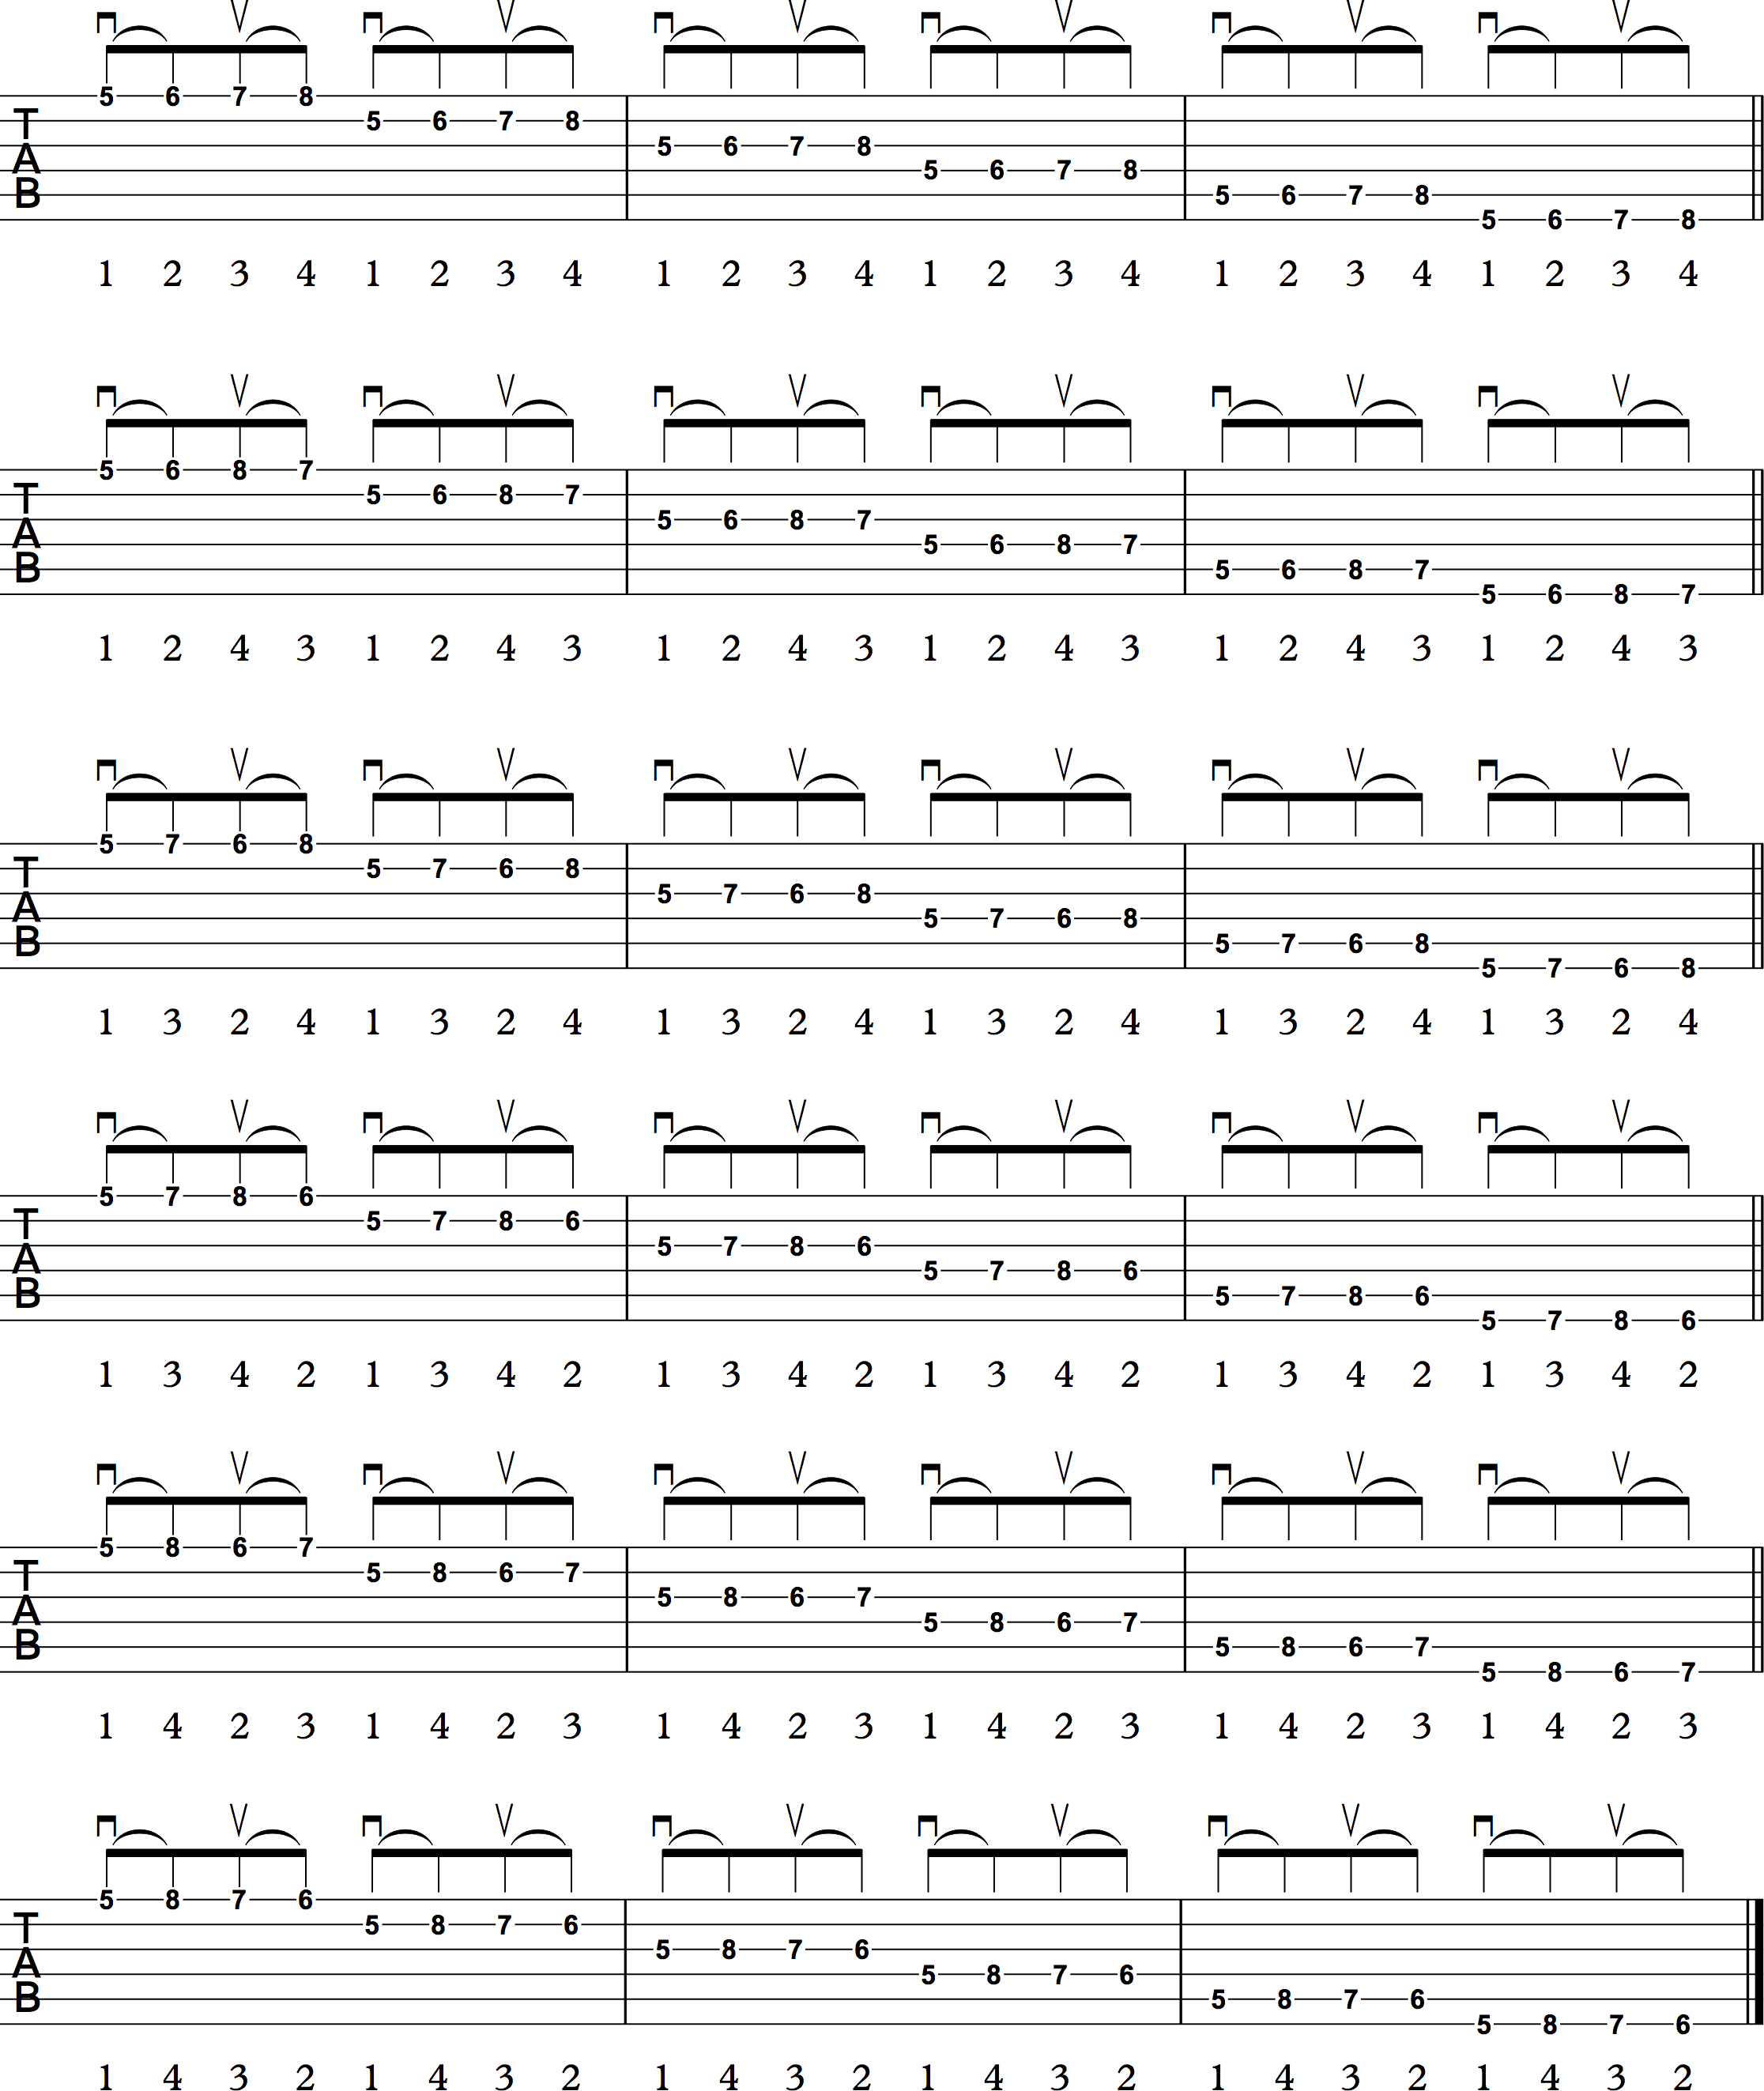 Guitar Exercises - Sheet Music